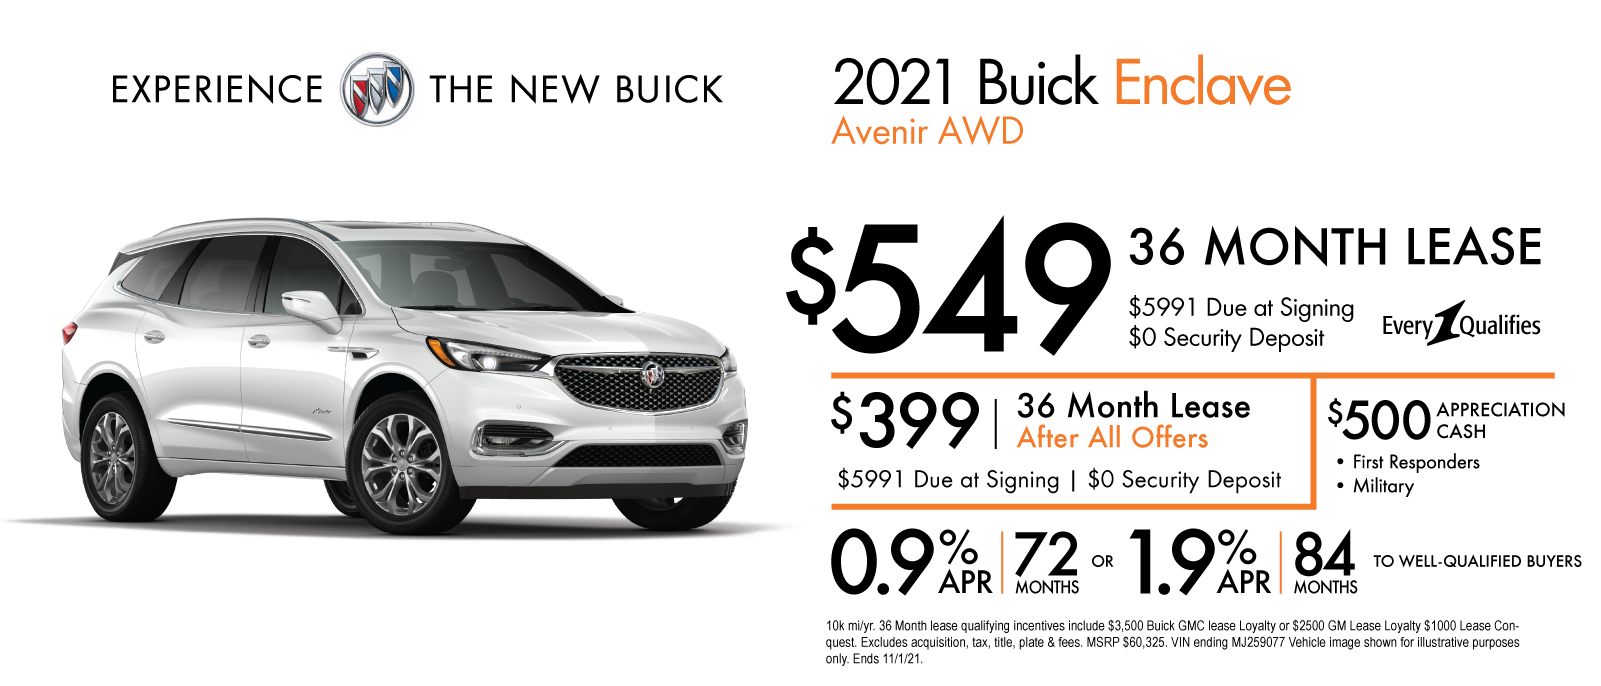 October-2021-Buick-CS-Slides_2021-Buick-Enclave-Avenir